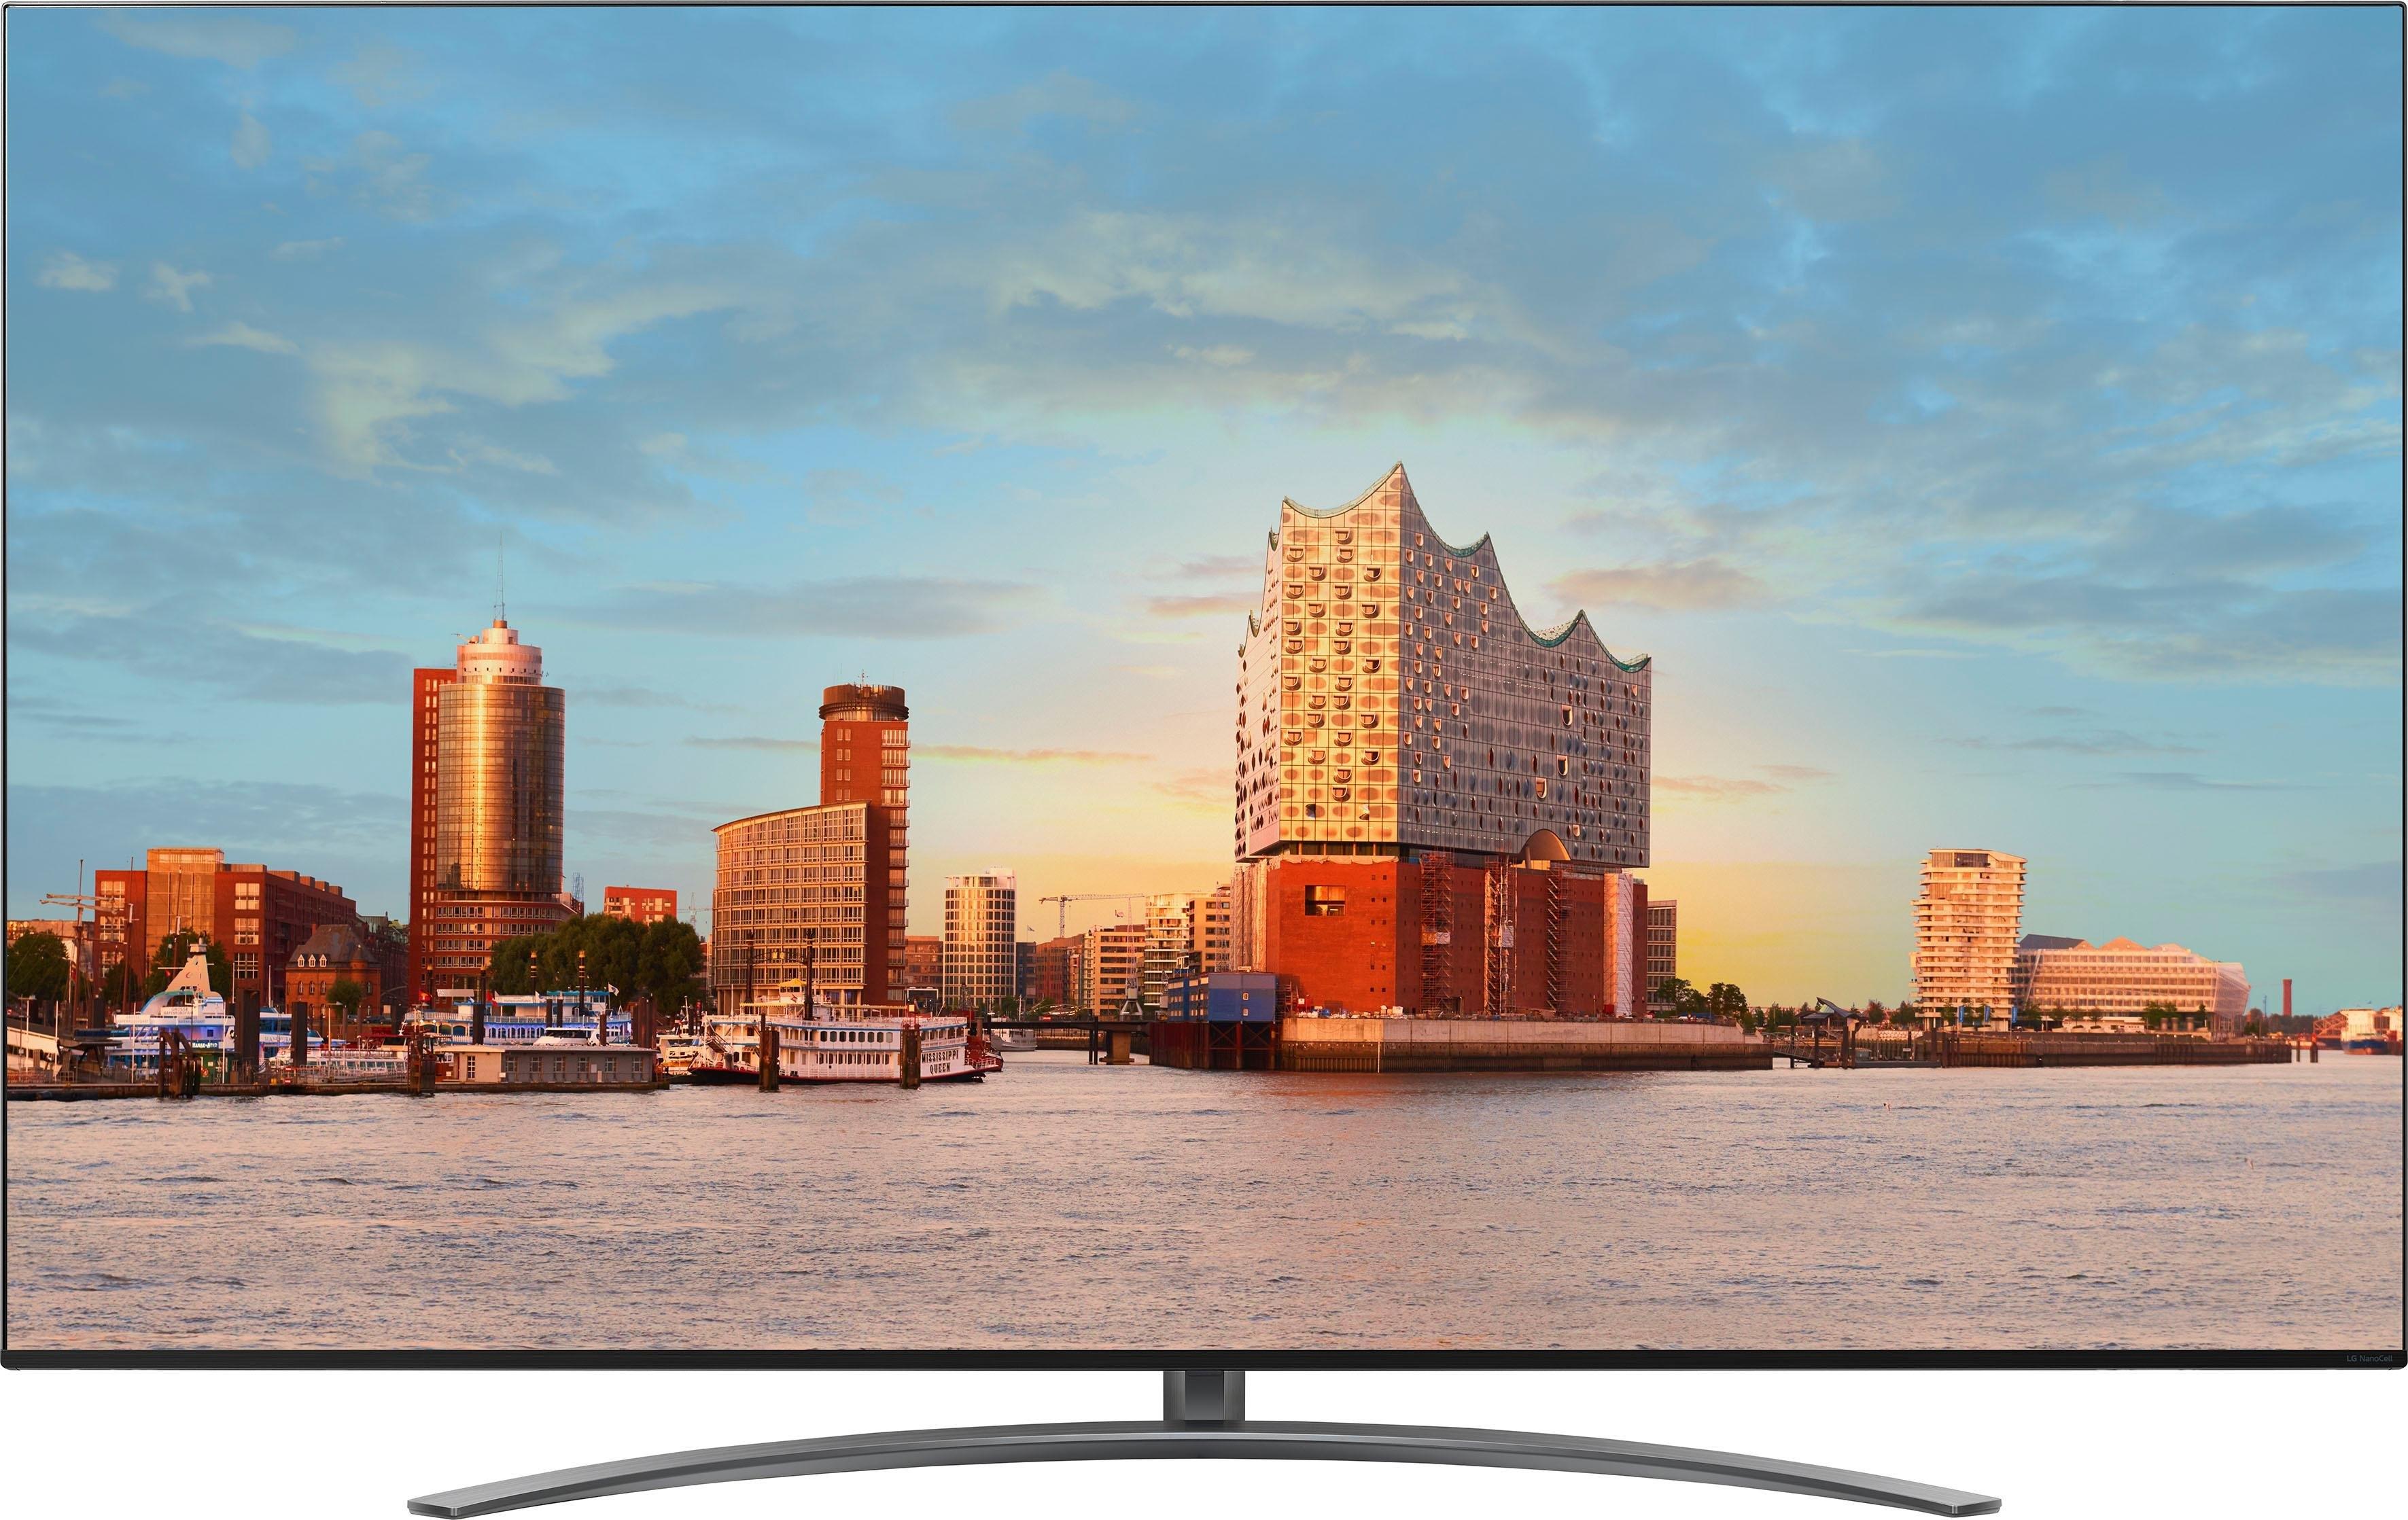 LG 86SM9000PLA led-tv (217 cm / 86 inch), 4K Ultra HD, smart-tv - gratis ruilen op otto.nl